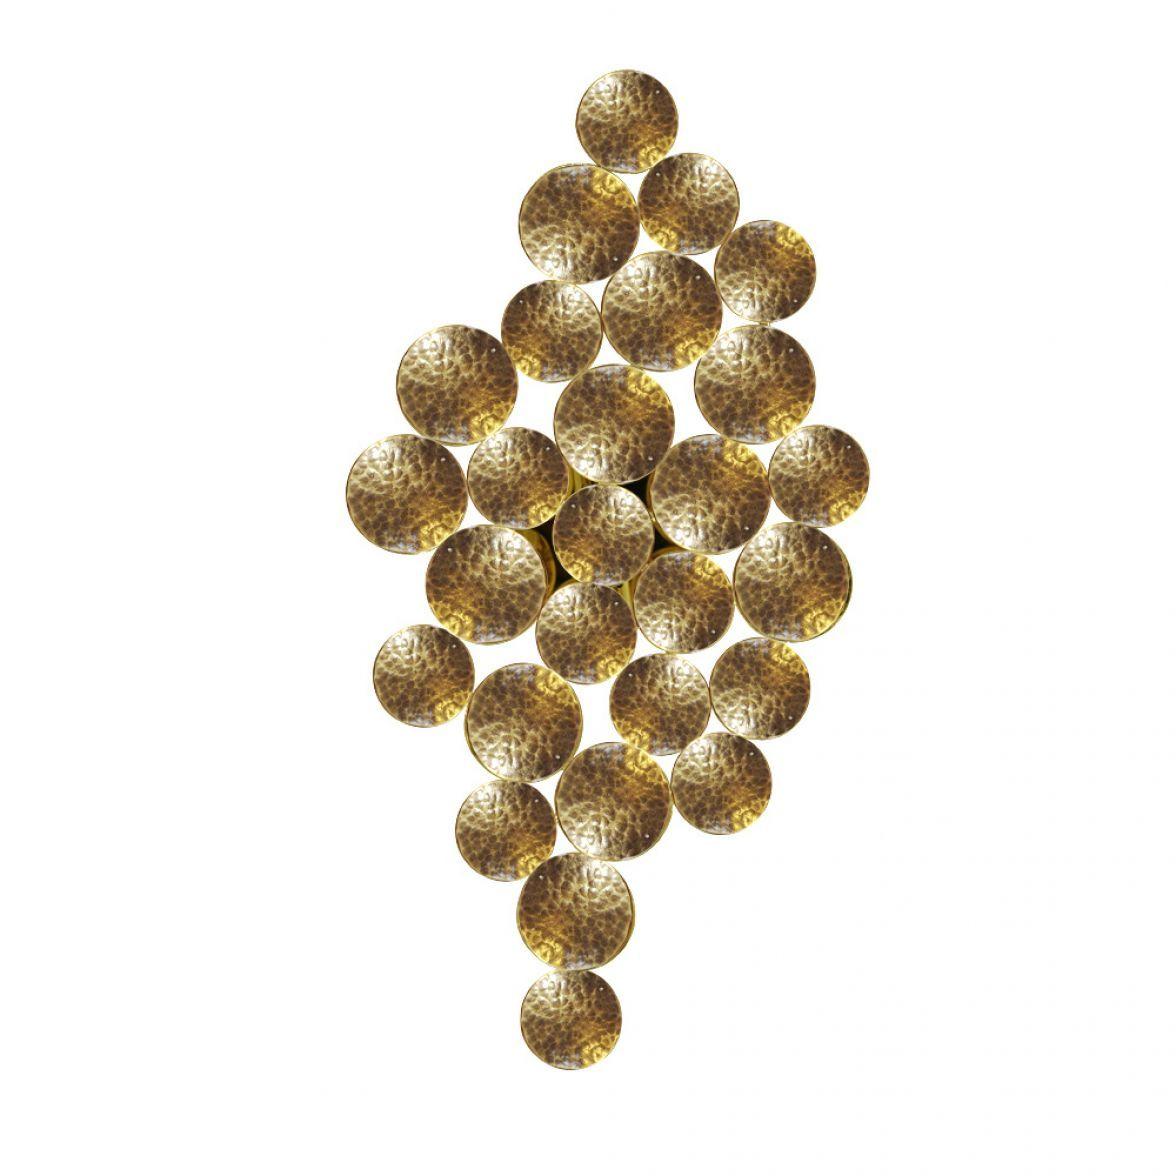 Настенная лампа Grapes  фото цена